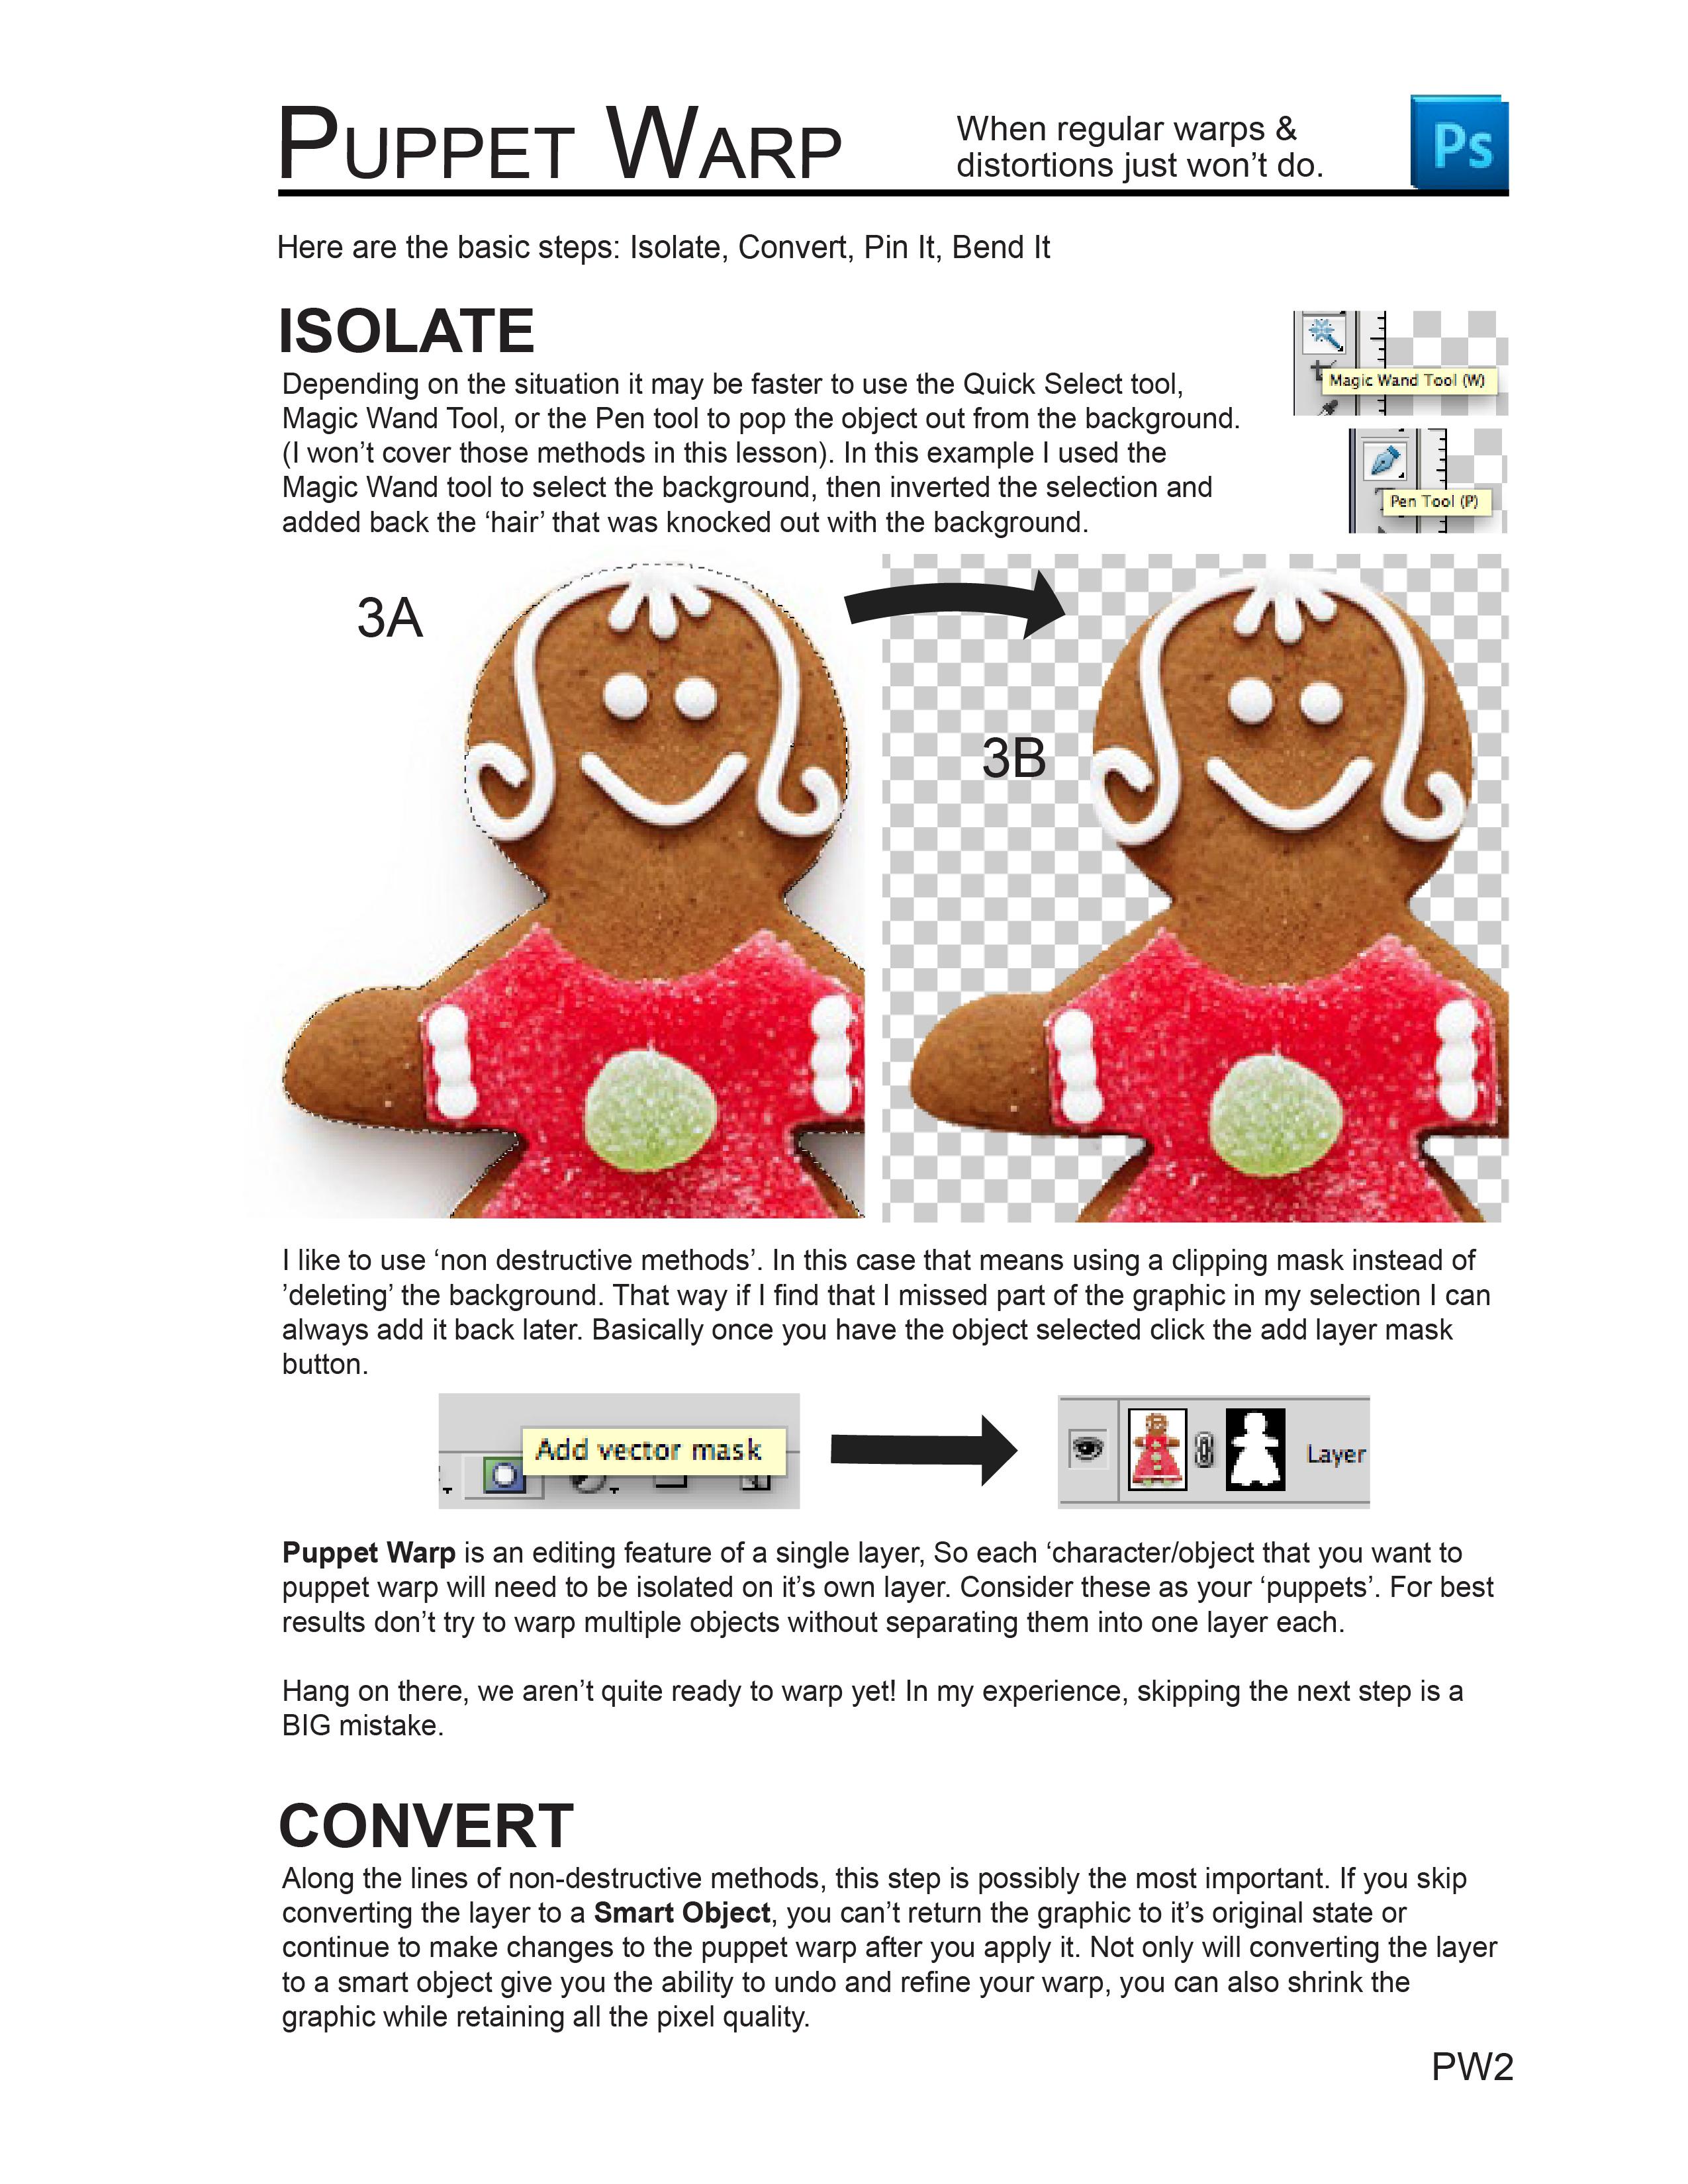 Puppet warp tutorial adobe photoshop tradigital art designs puppetwarptutorial 01 puppetwarptutorial 02 baditri Image collections